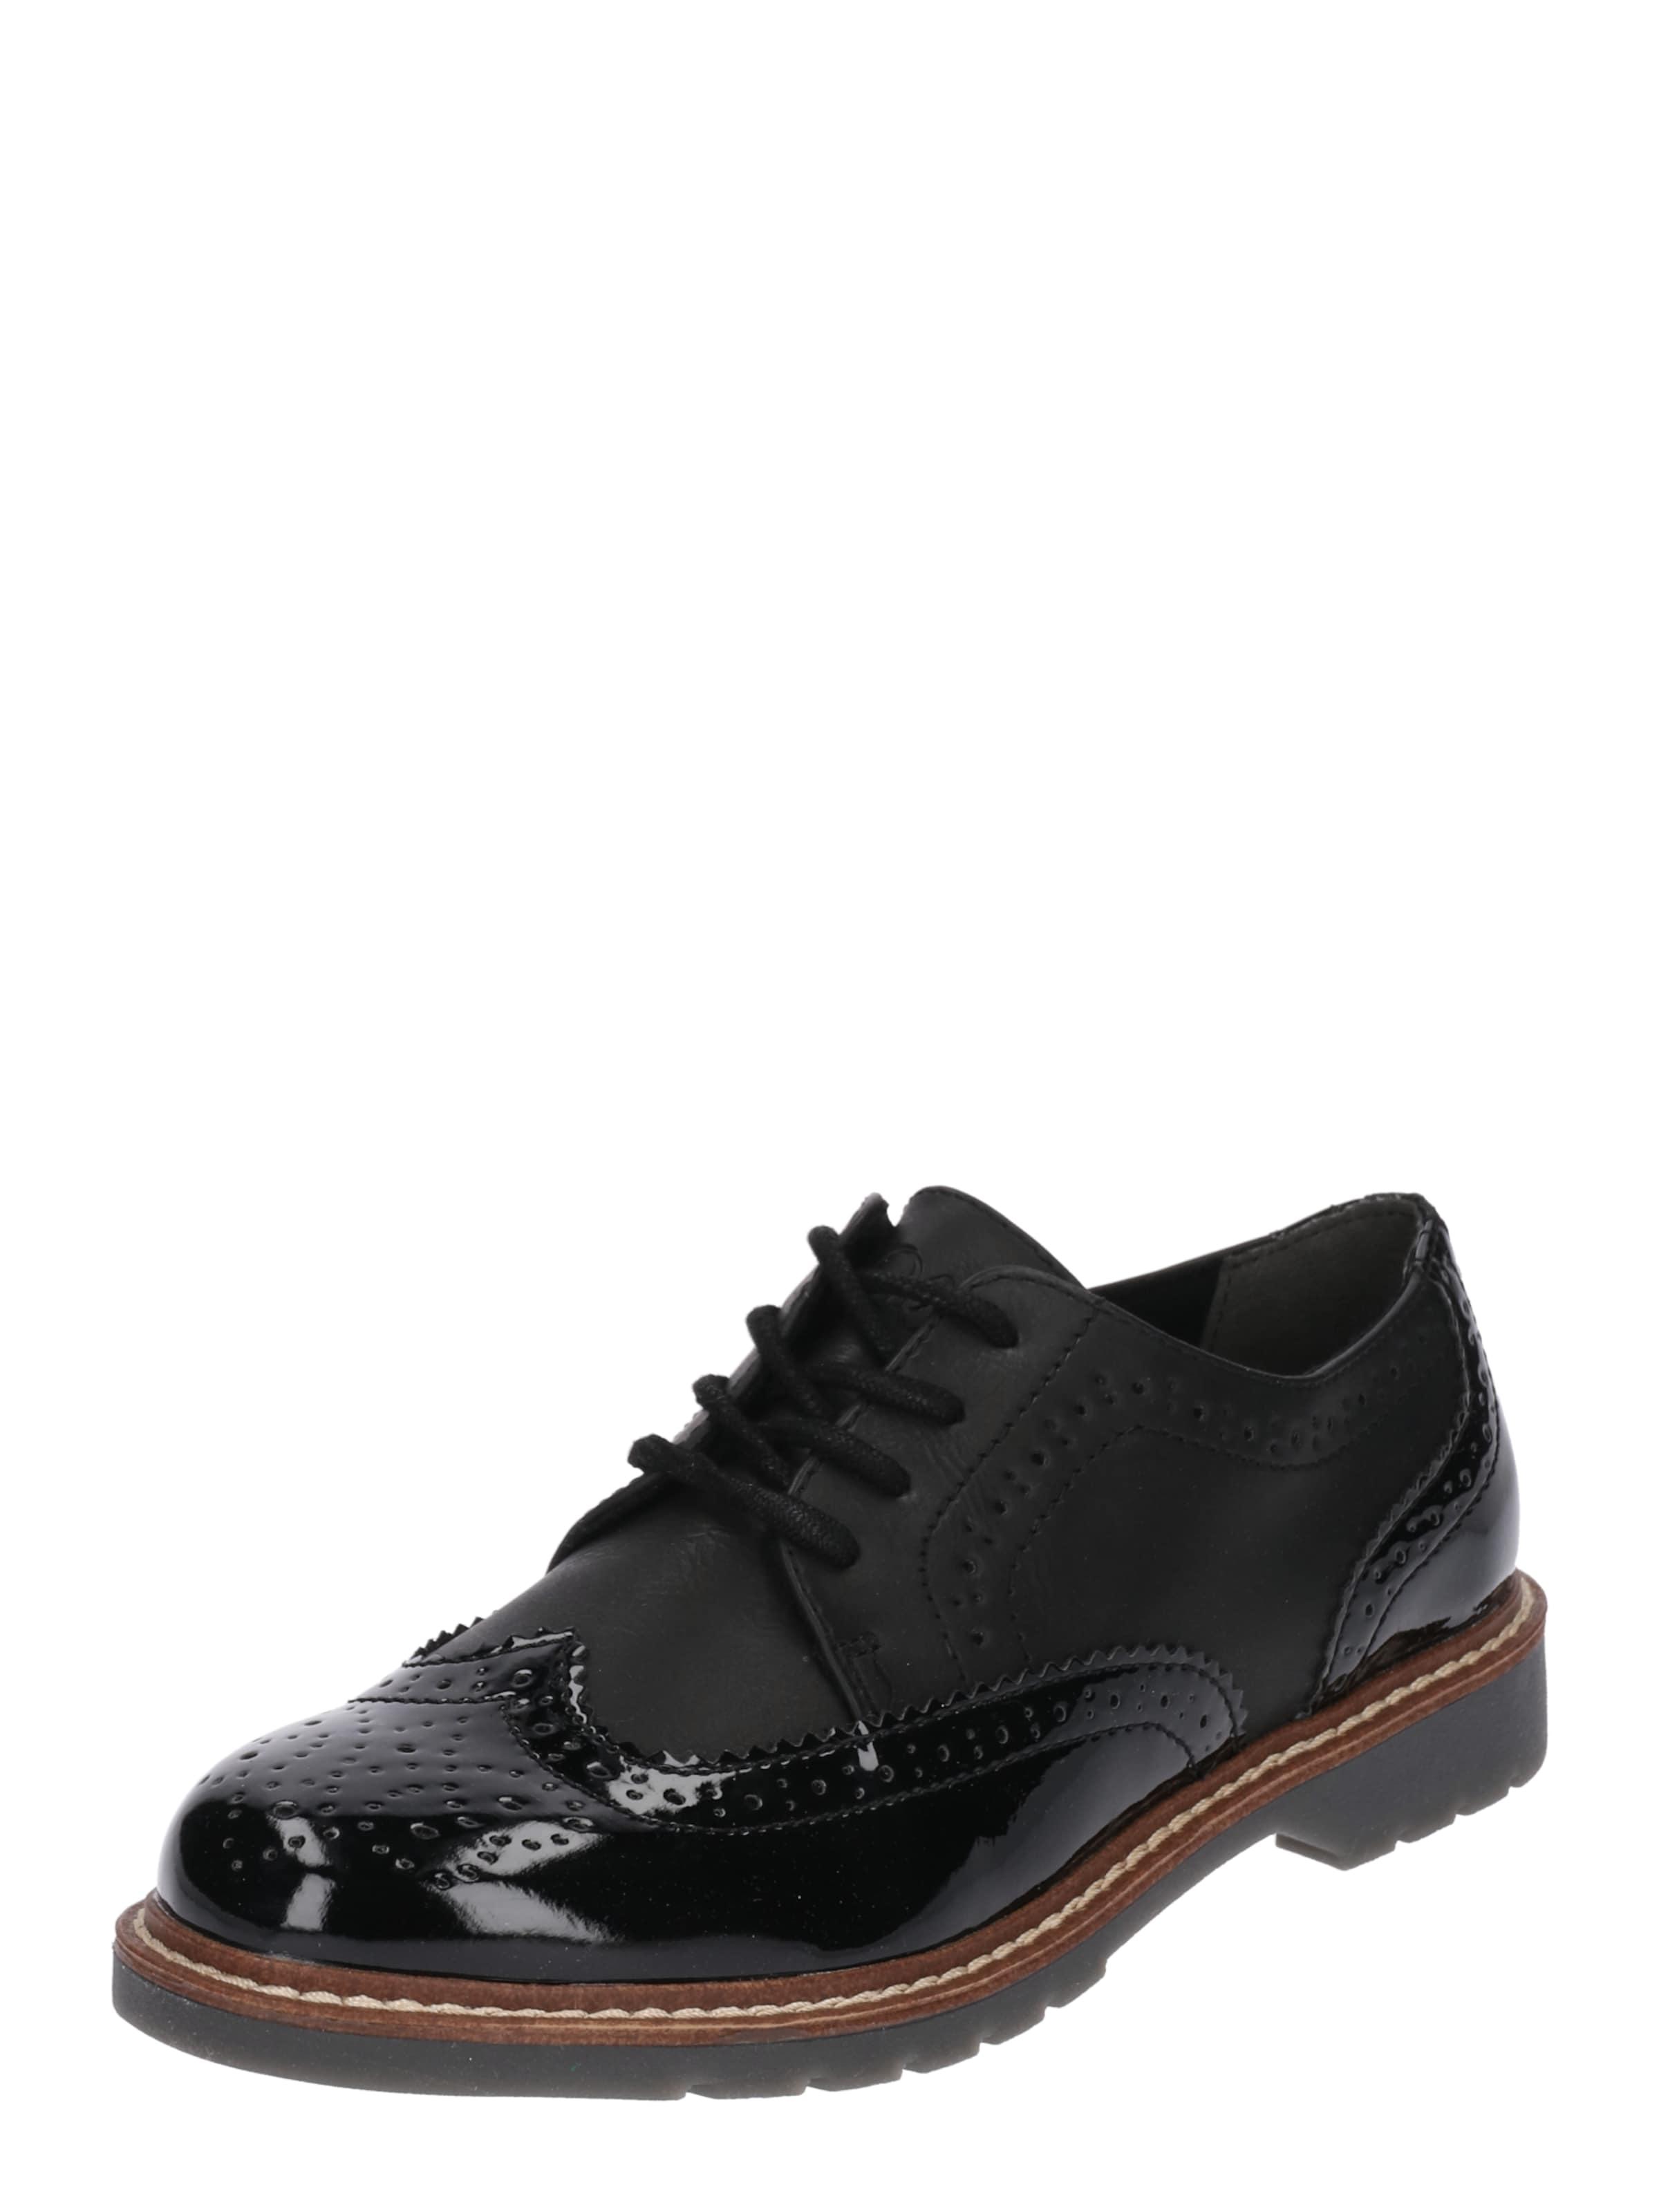 Haltbare Mode billige Schuhe Halbschuh s.Oliver RED LABEL | Halbschuh Schuhe Schuhe Gut getragene Schuhe e2b371